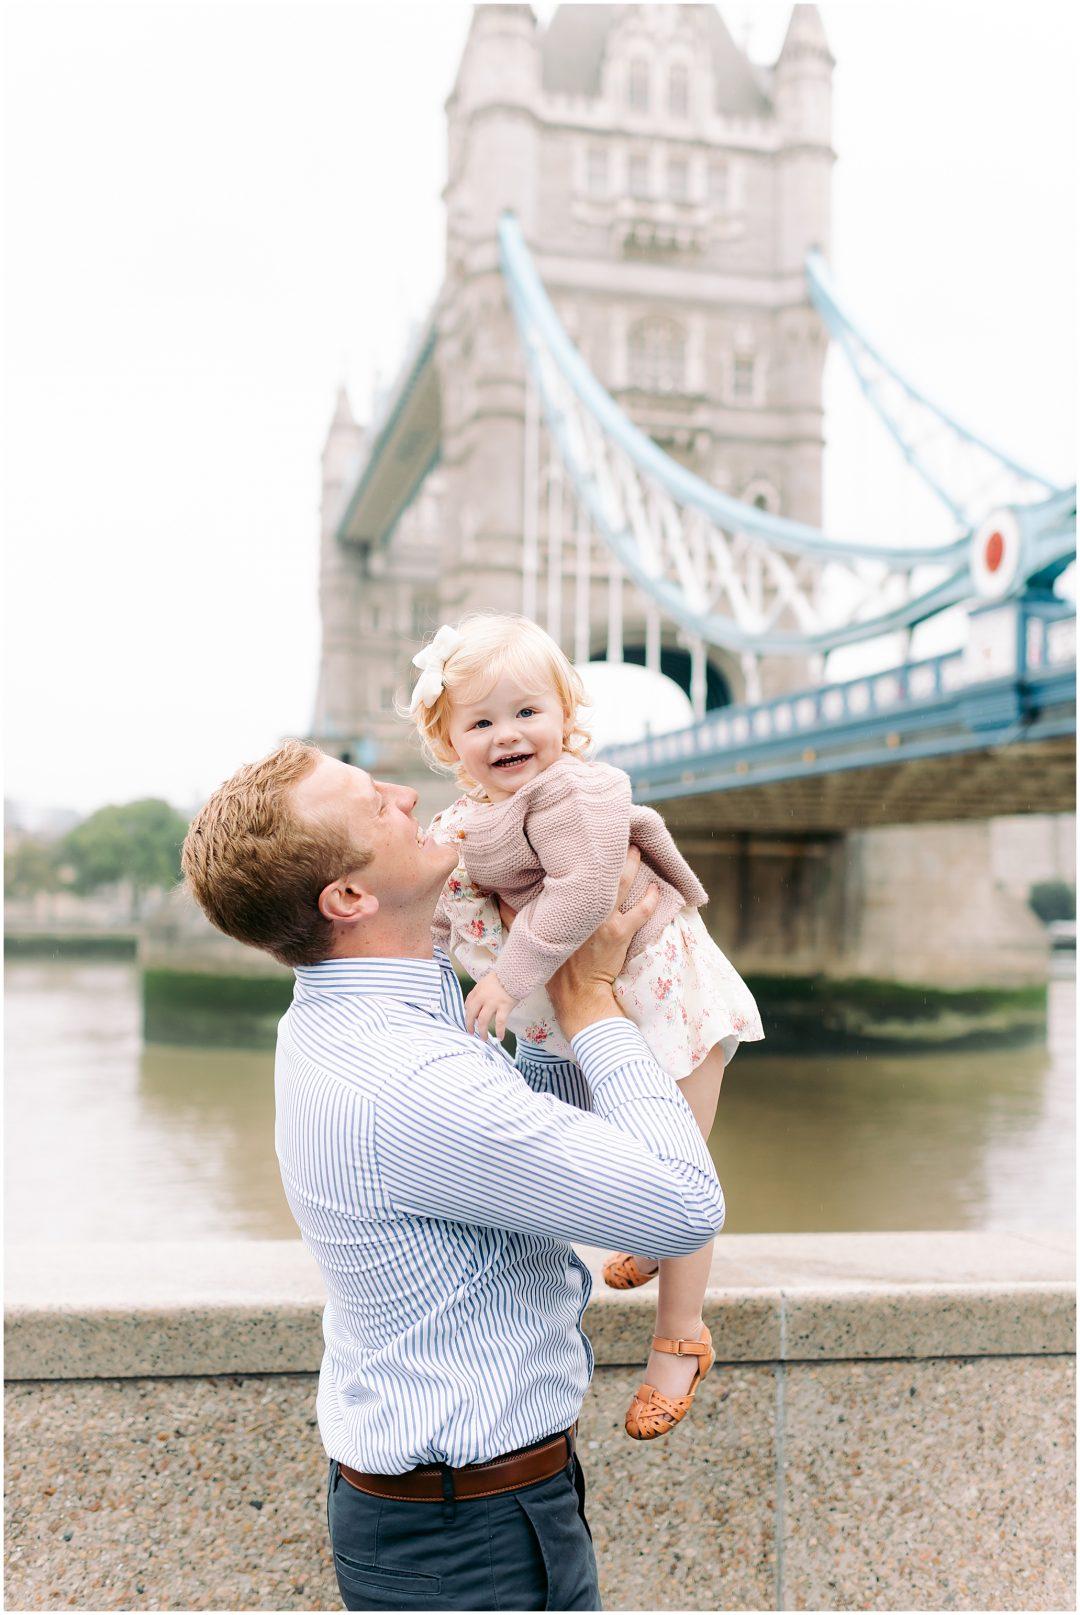 London family photographer, Tower Bridge - family - London family photographer Tower Bridge family shoot Nkimaphotography 0024